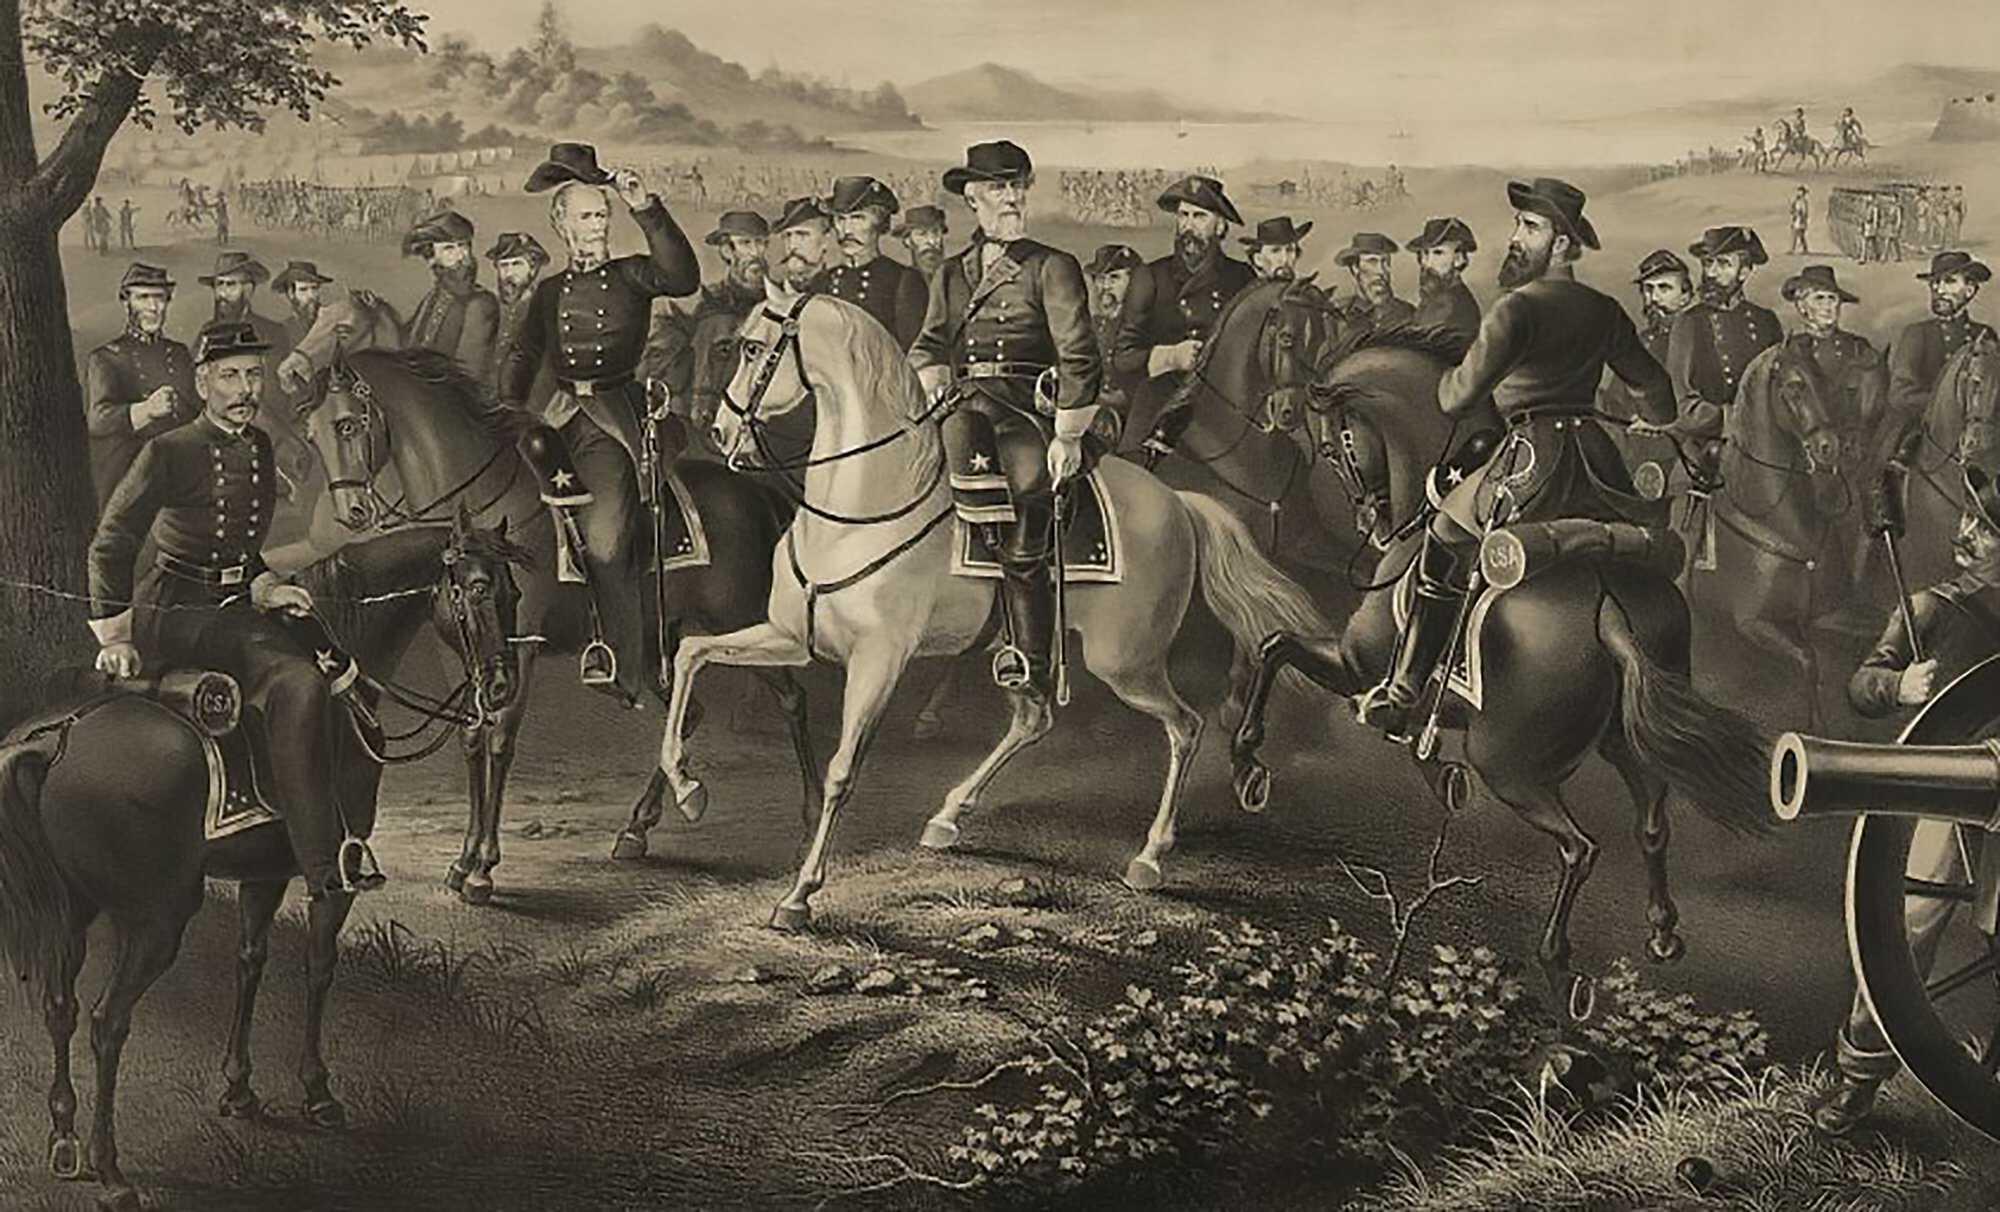 Lee-Surrender-Generals-Robert-E.-Lee-and-21-Confederate-generals,-all-on-horseback-LOC-1867.jpg